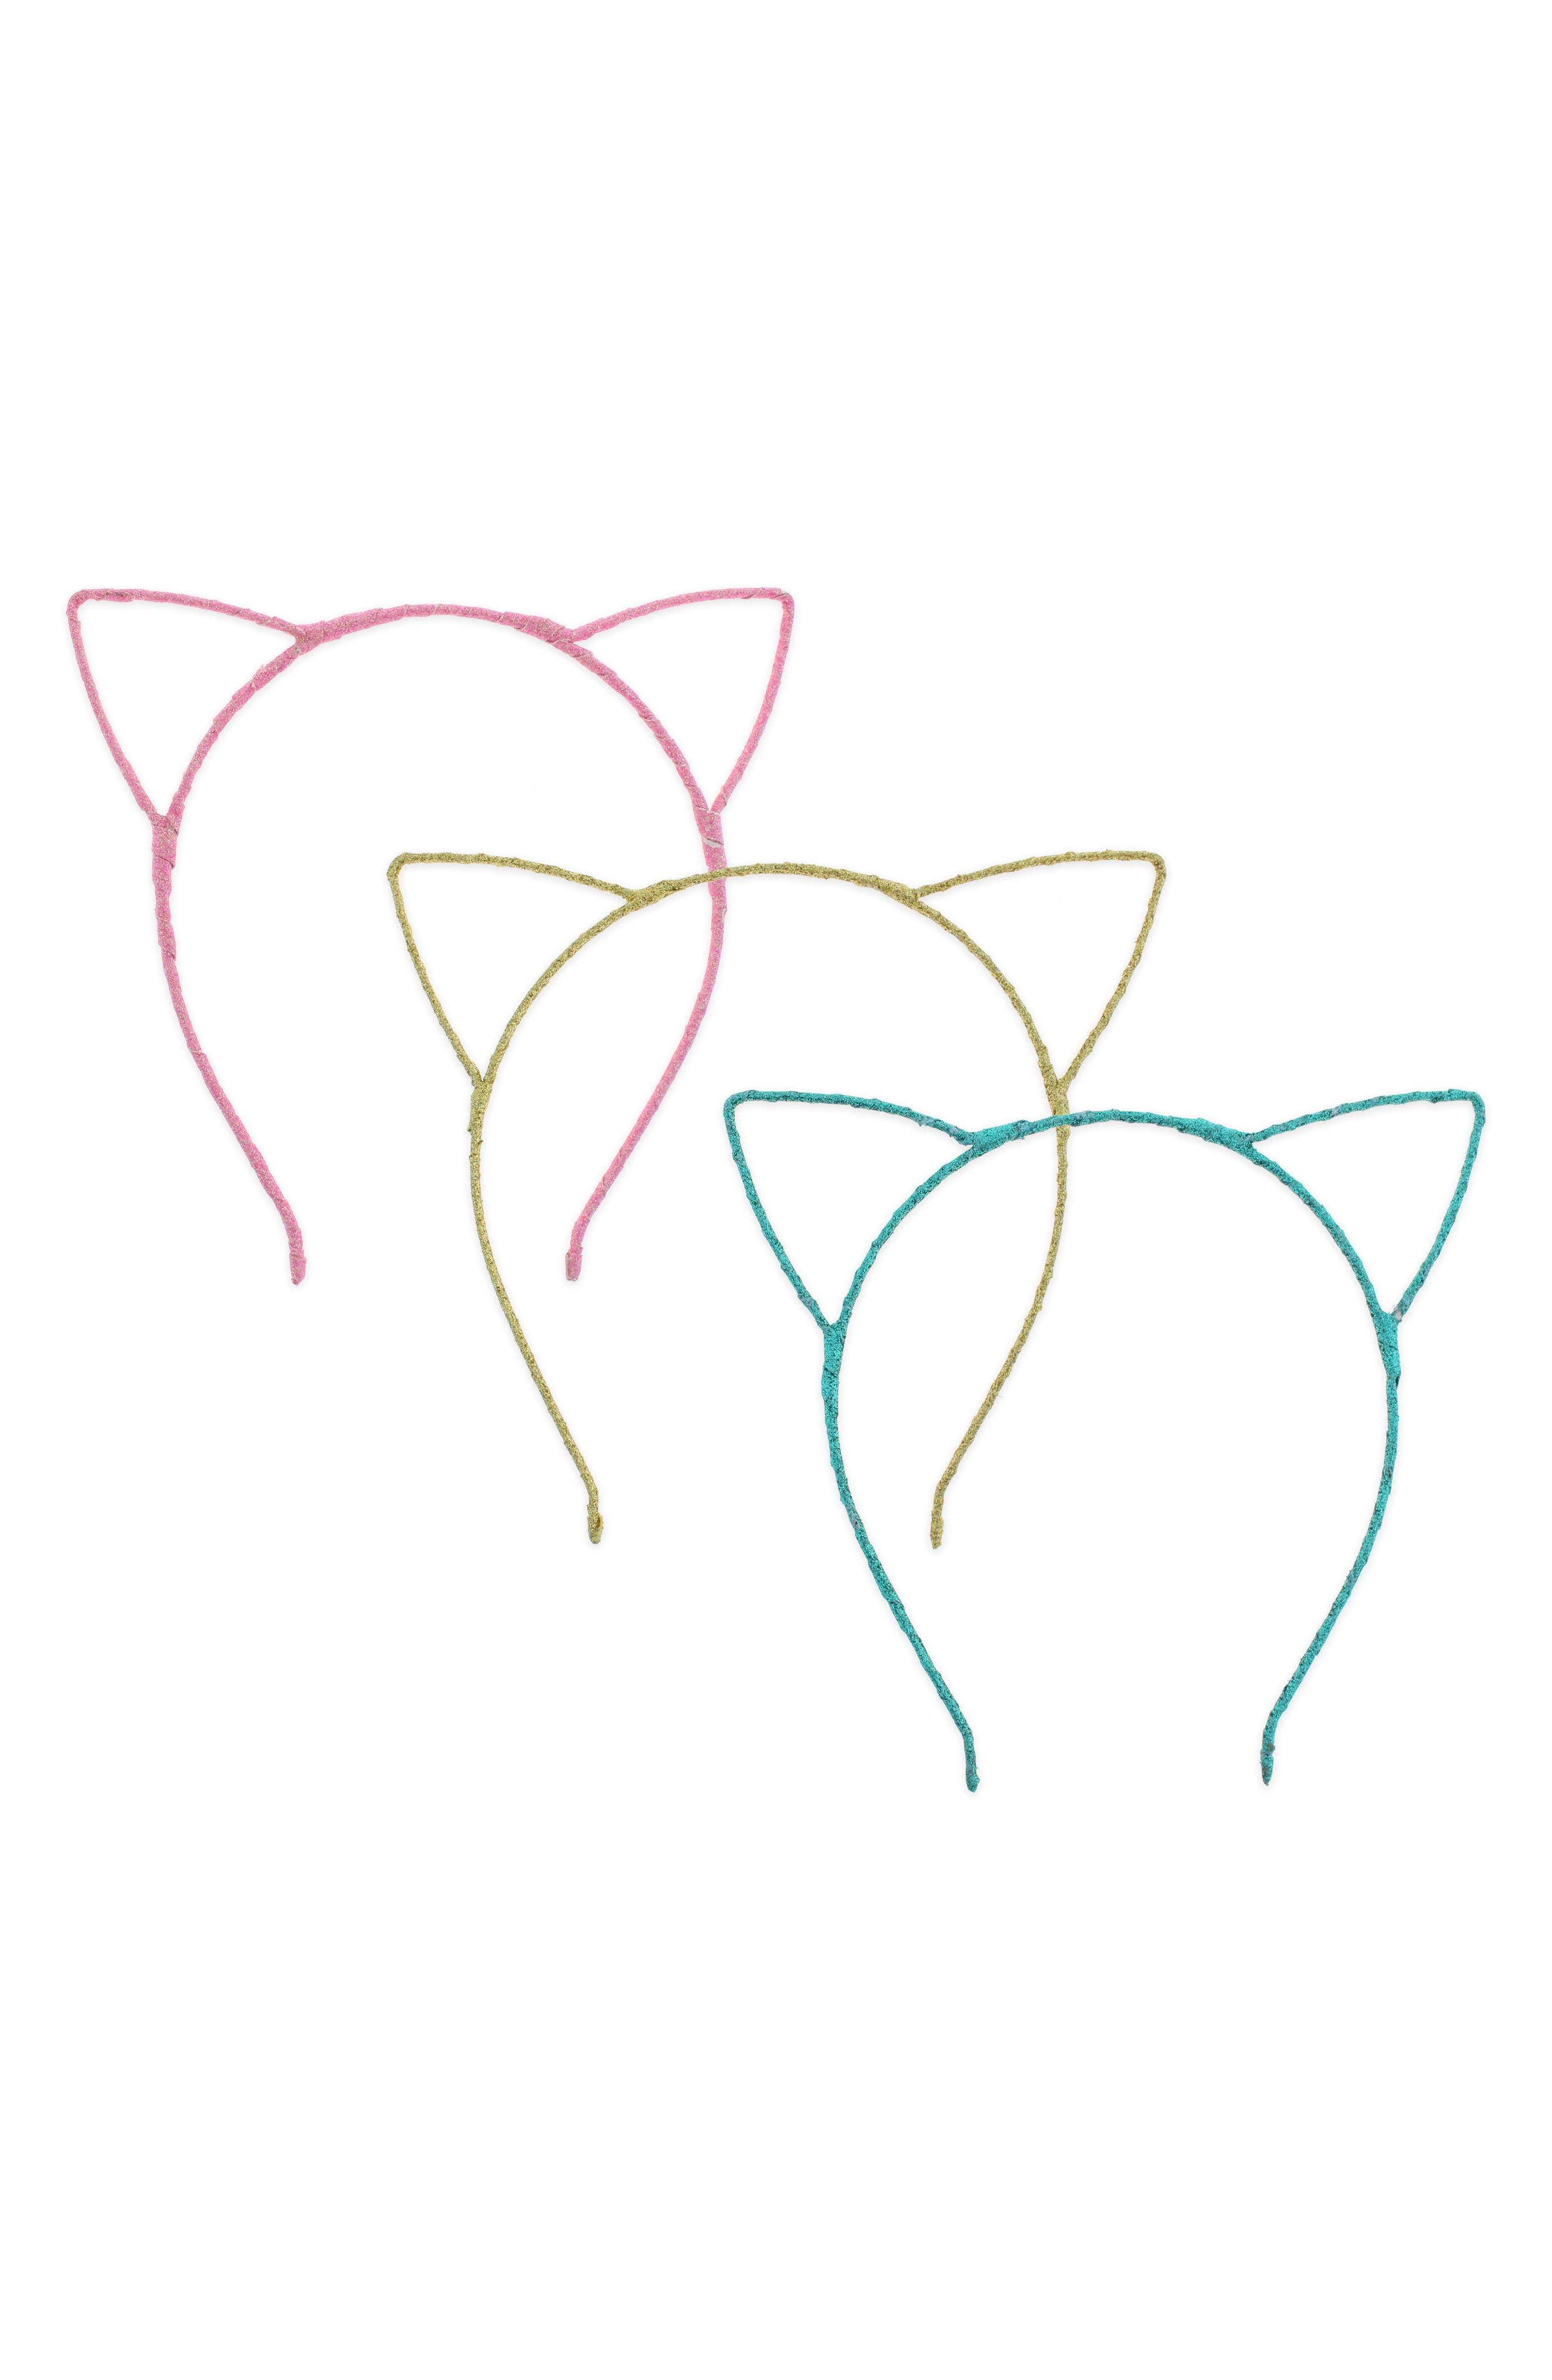 Glitter Cat 3-Pack Headband Set,                             Main thumbnail 1, color,                             651